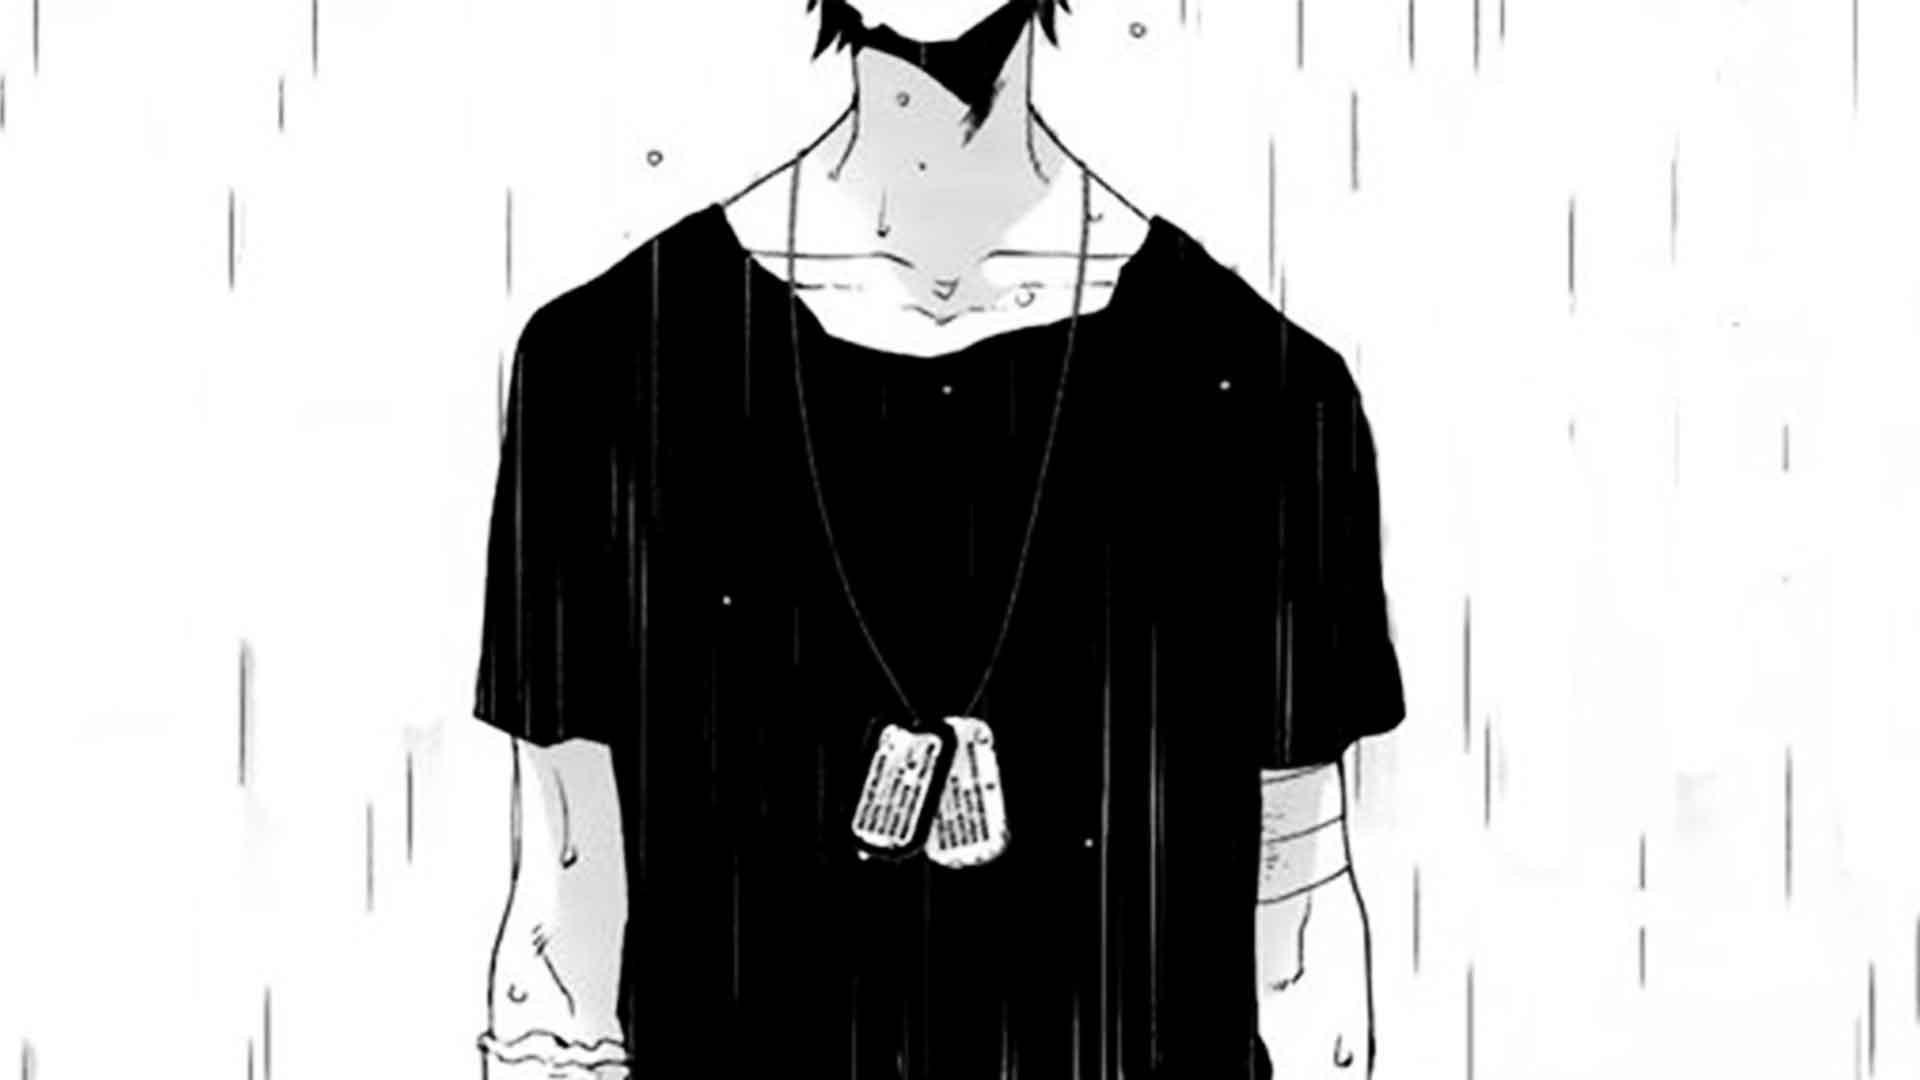 1920x1080, Sad Anime Boy In The Rain Sketch Sad Boy - Alone Sad Anime Boy - HD Wallpaper